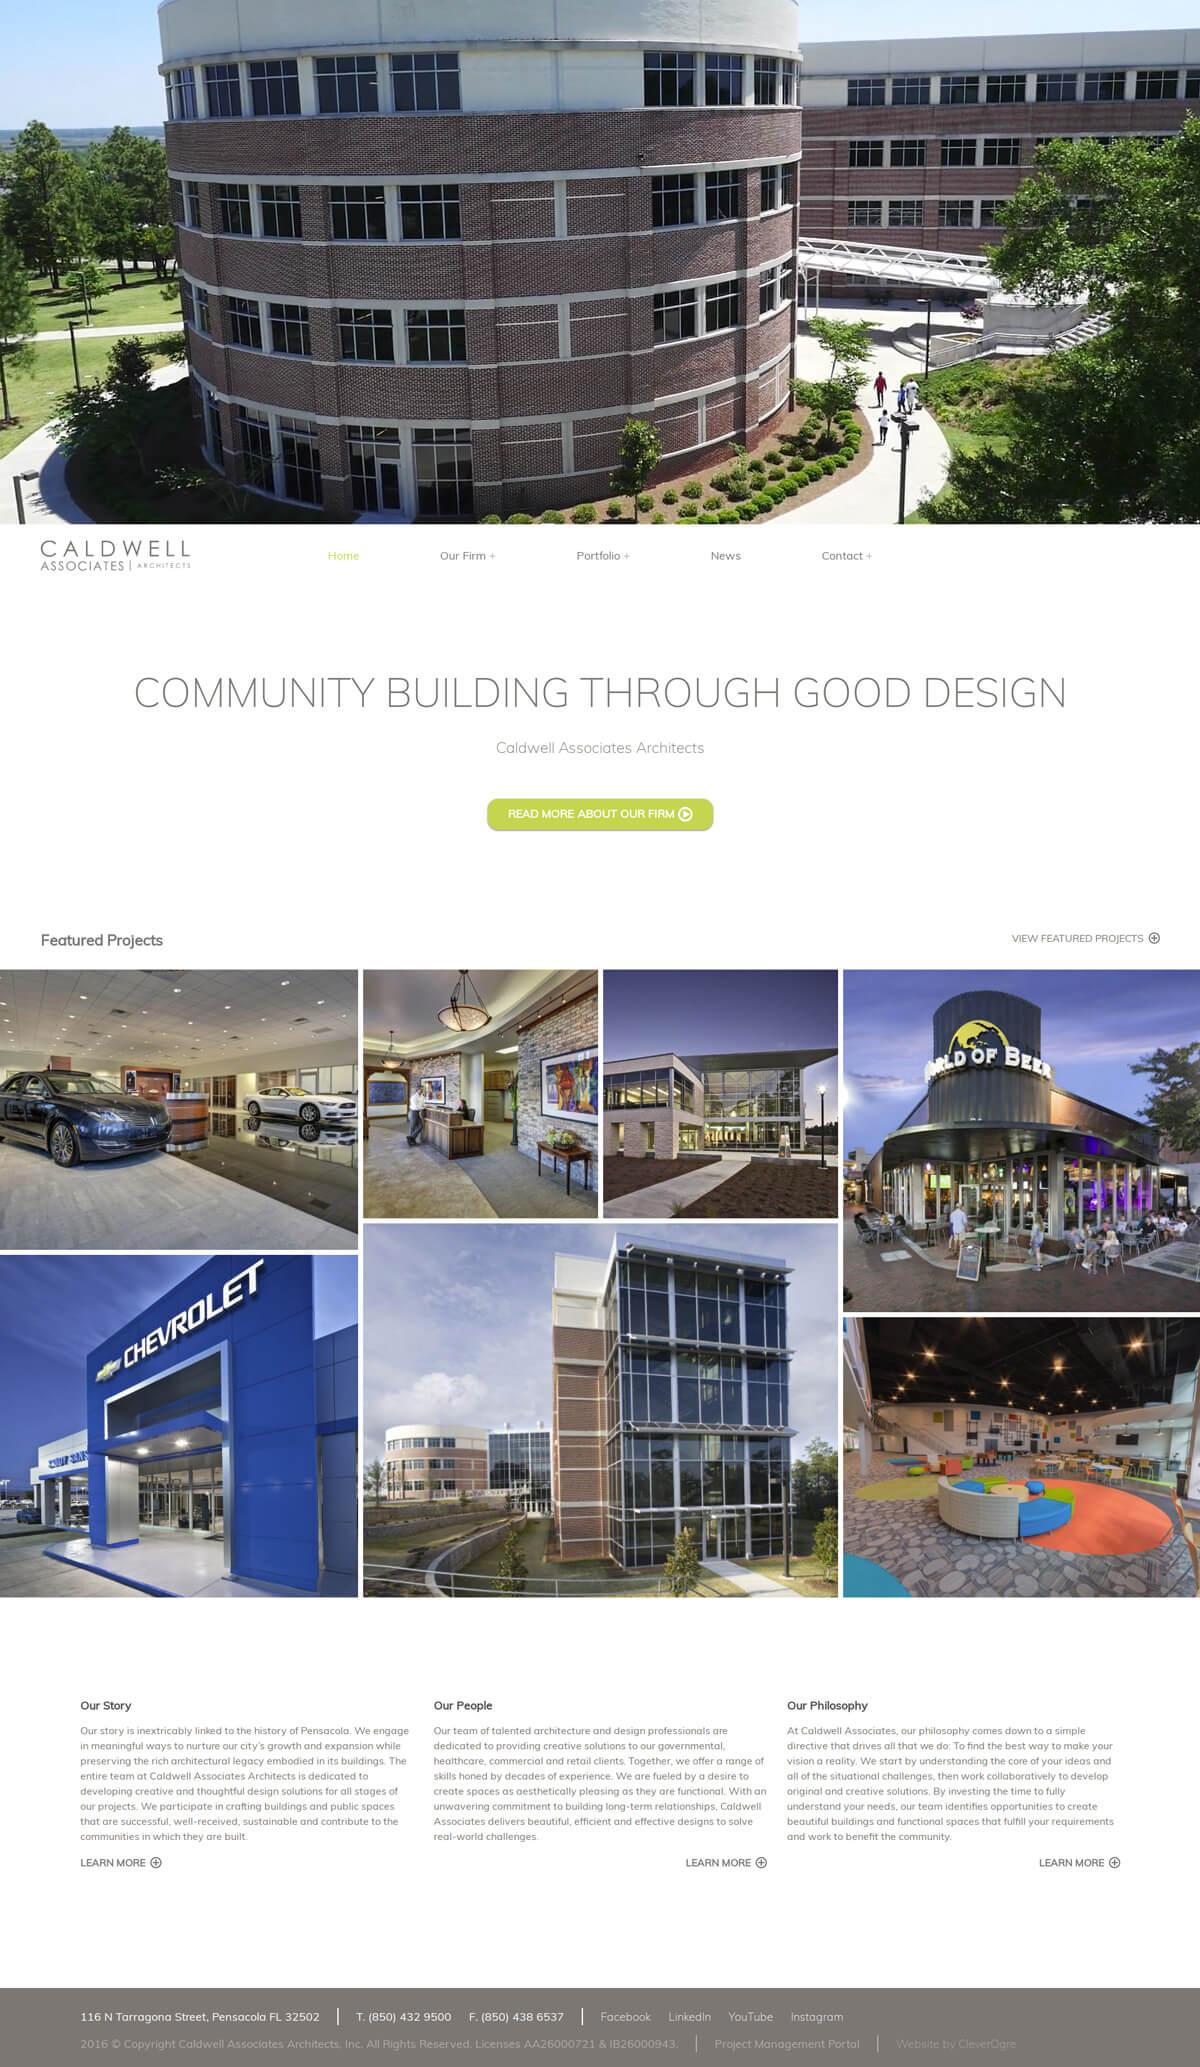 Caldwell-Associates-Architects-in-Pensacola-Florida